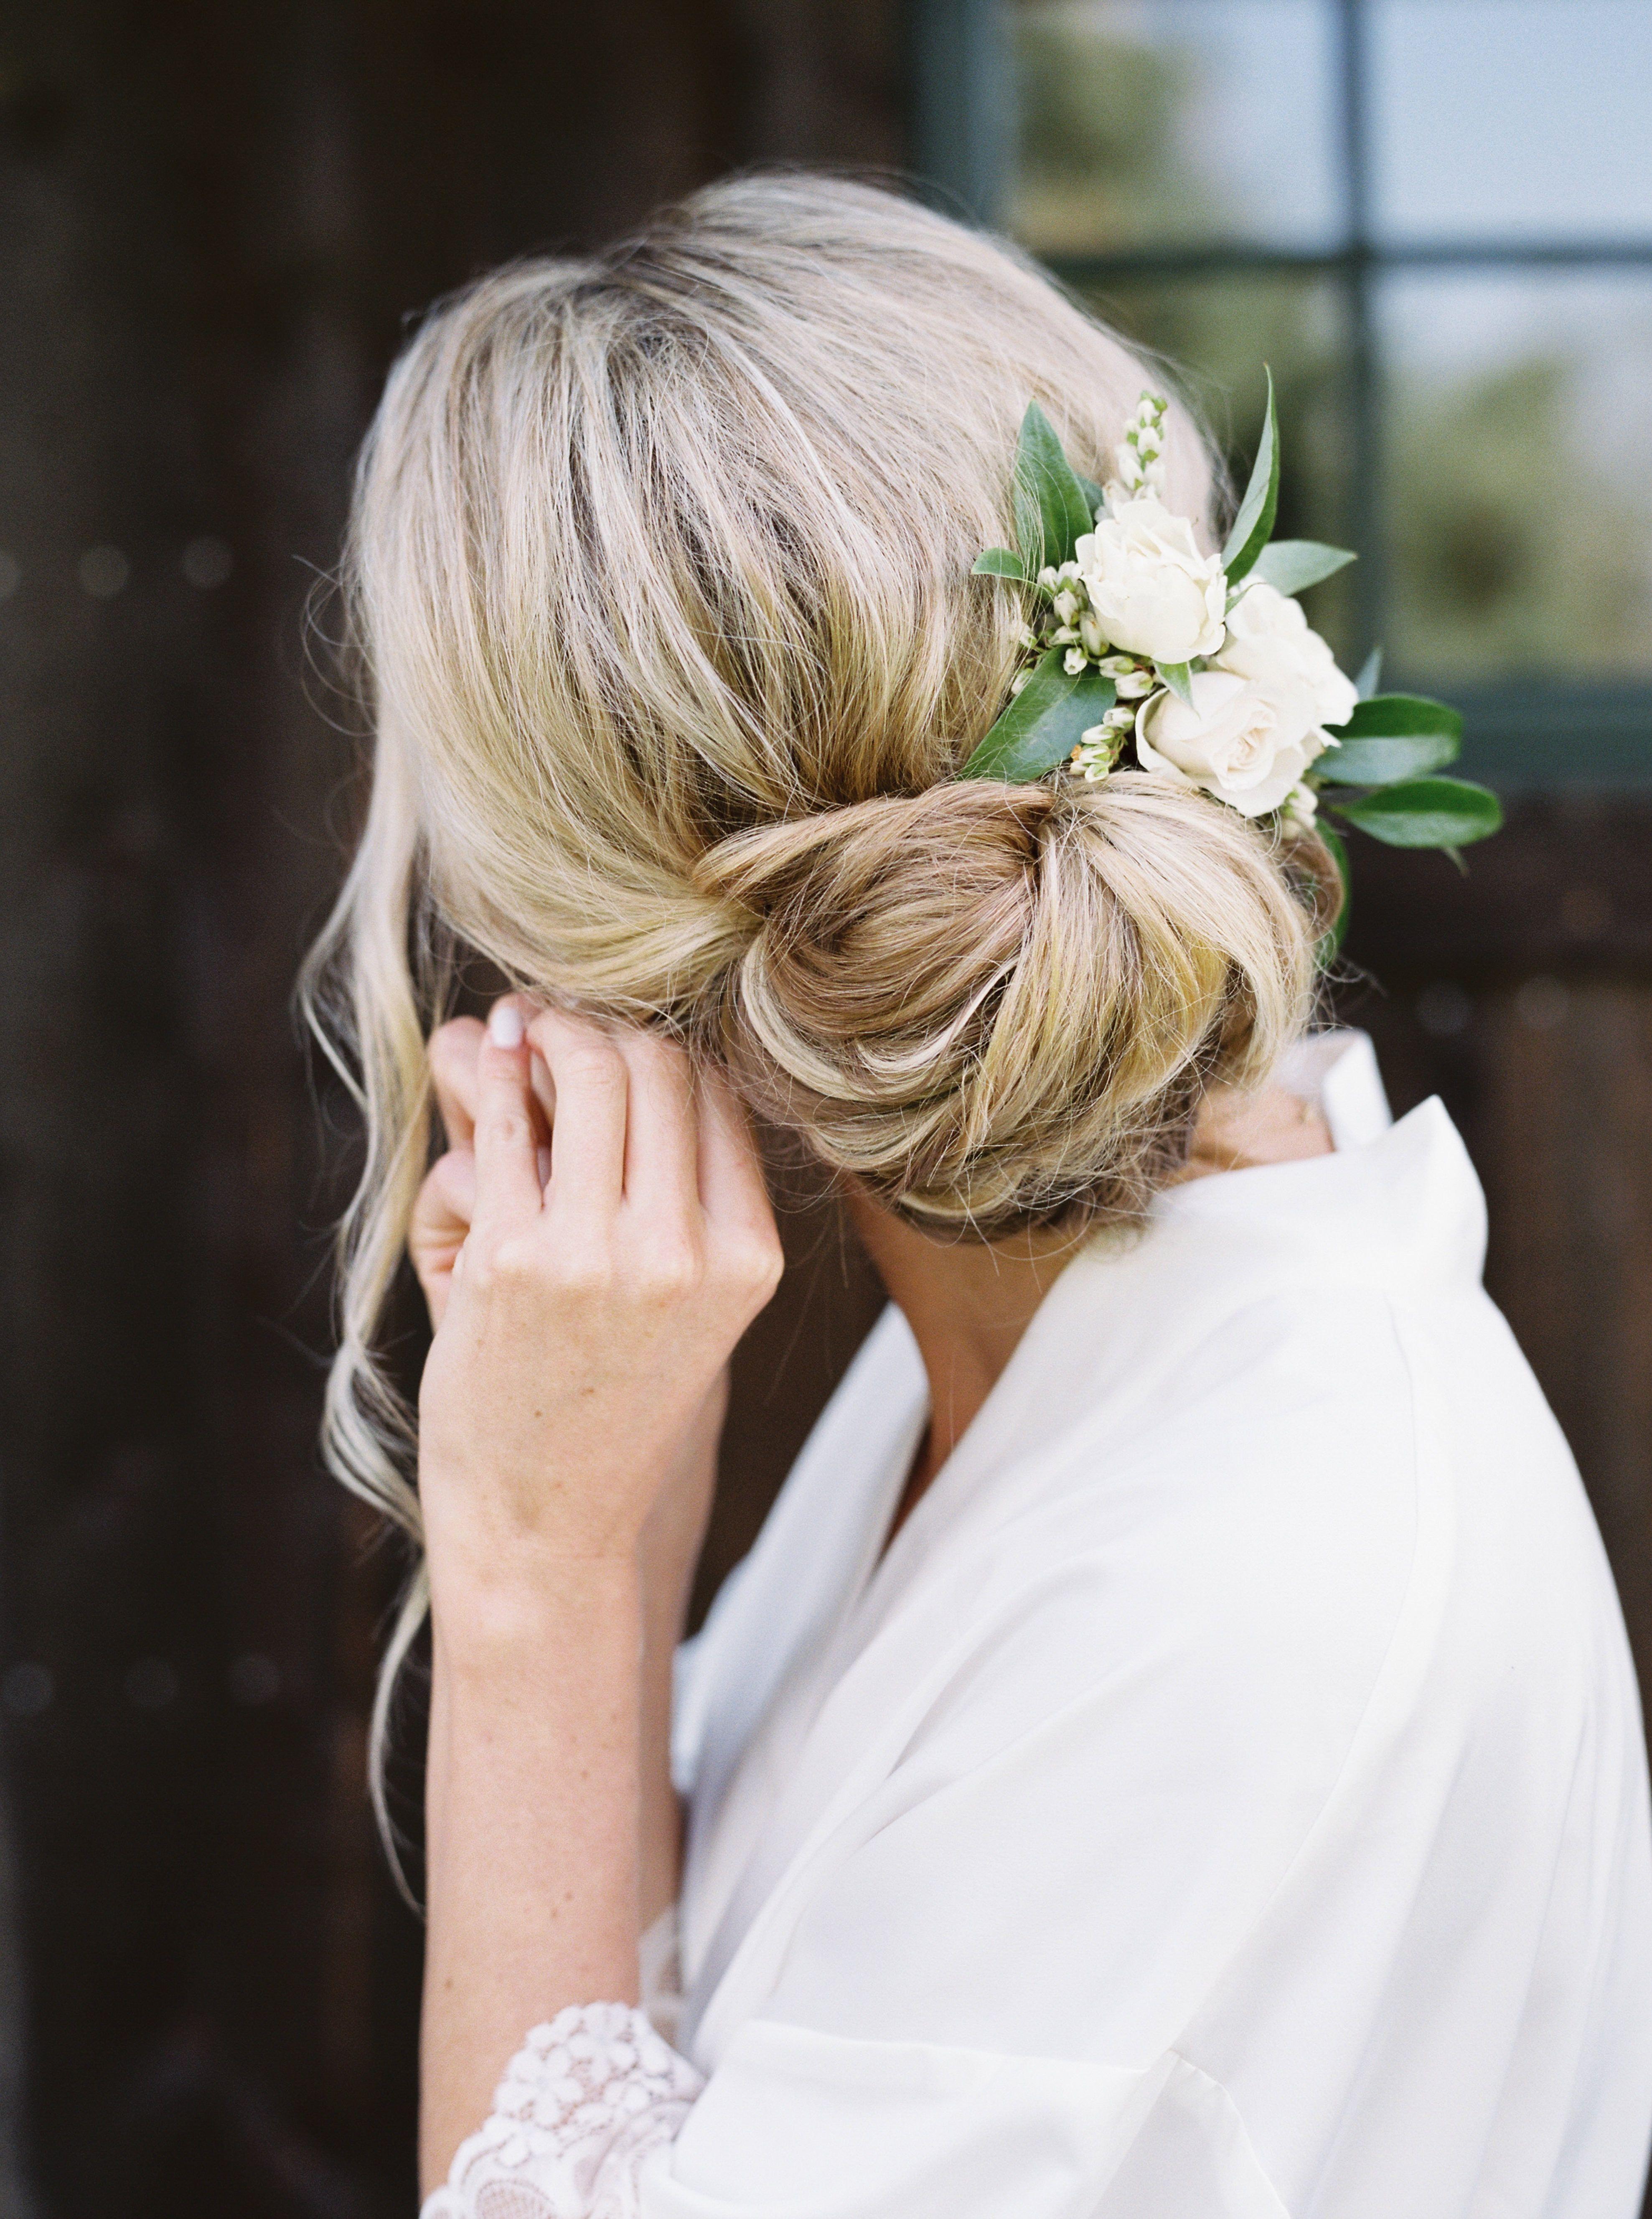 hair wedding hair bridal hair updo sleek updo classic updo